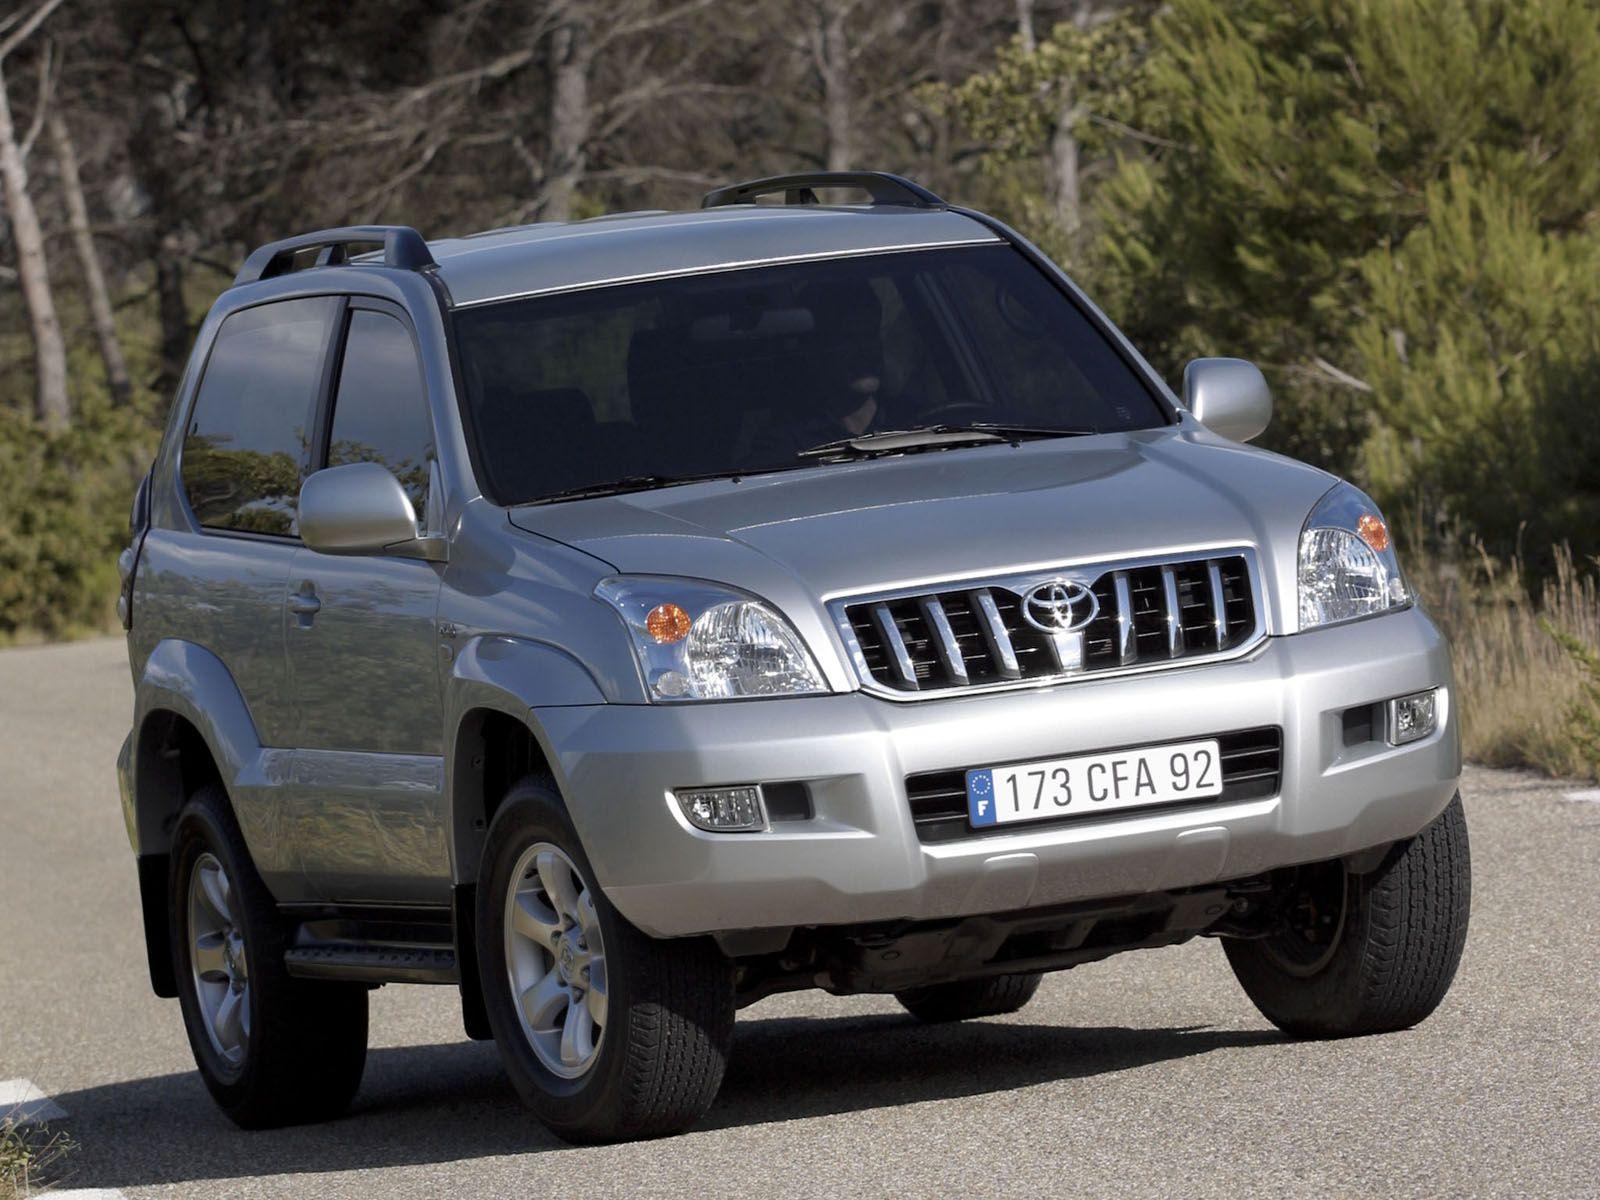 Toyota Land Cruiser Prado 120 photos - PhotoGallery with ...